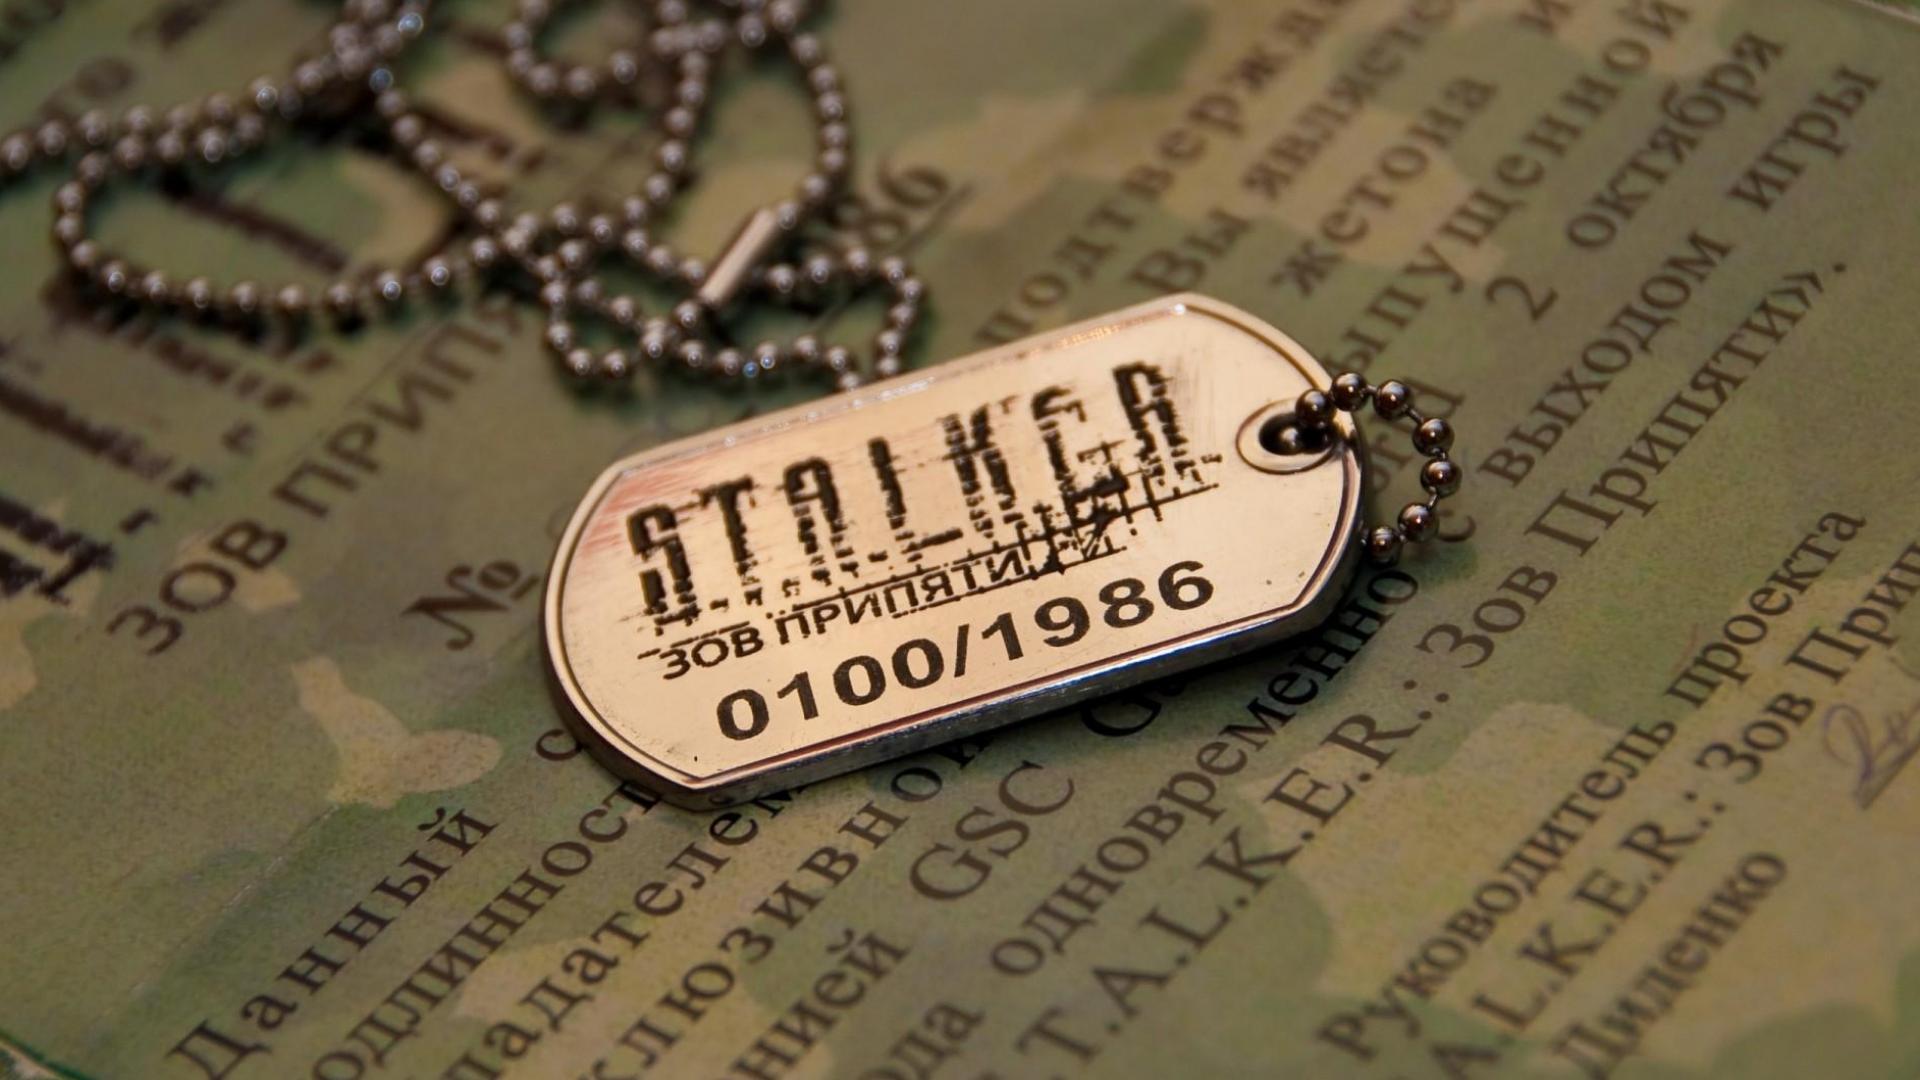 STALKER обои для рабочего стола, картинки, фото, 1920x1080.: http://hq-wallpapers.ru/wallpapers/games/pic4573_raz1920x1080